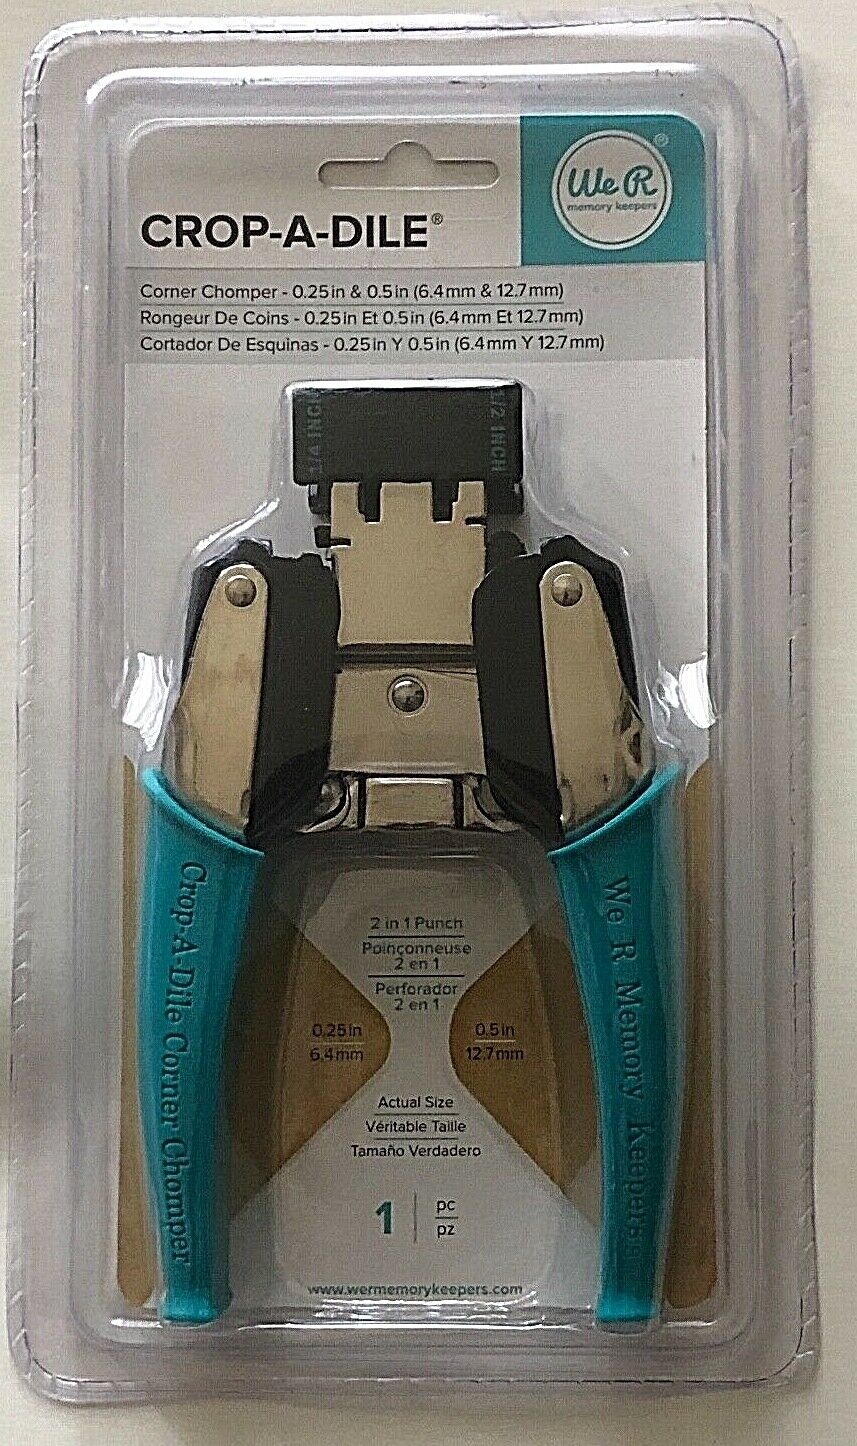 Aqua We R Memory Keepers Crop-A-Dile Corner Chomper Carrying Case